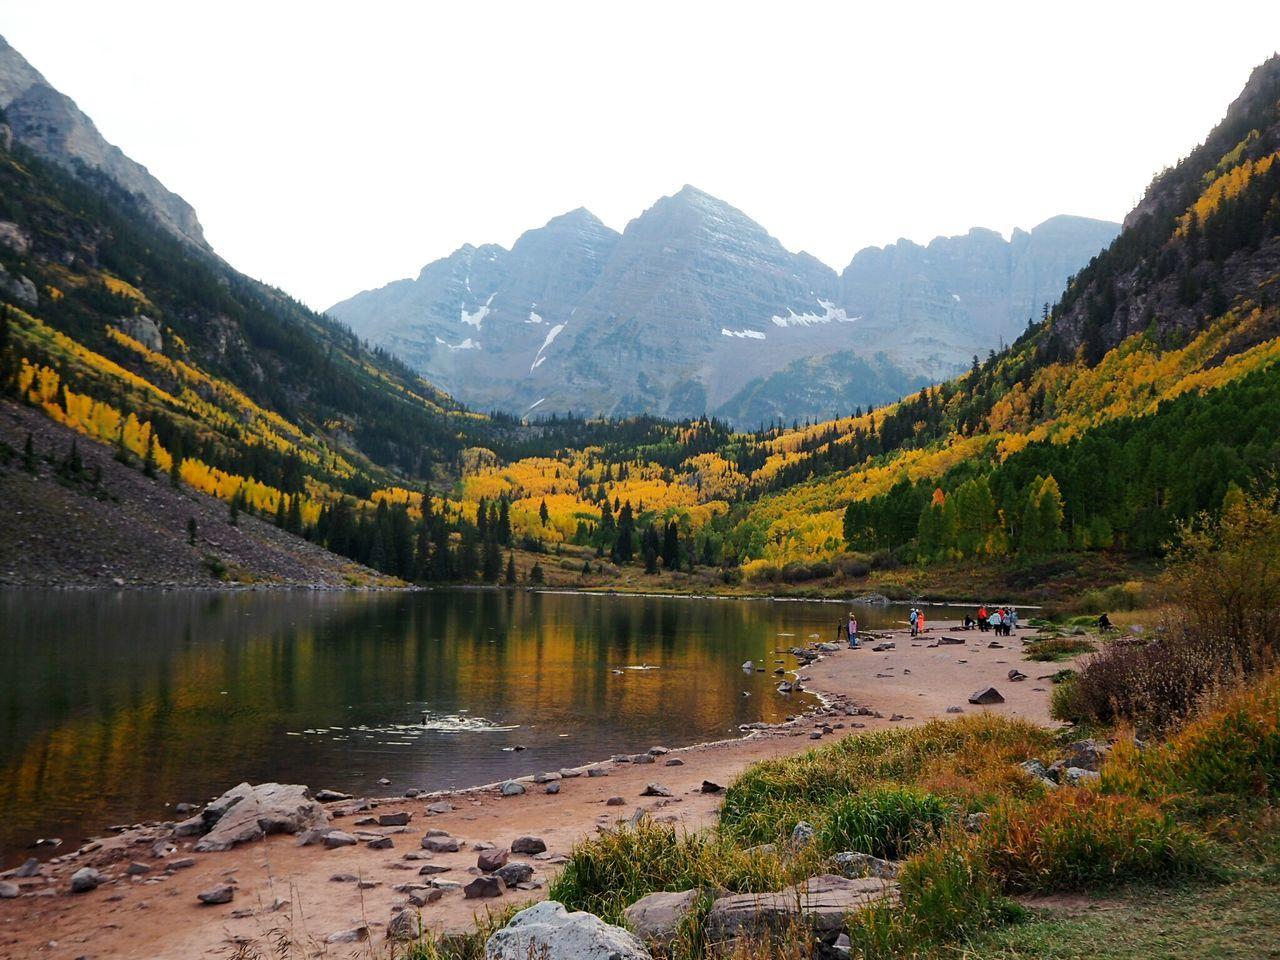 Maroonbells Aspen, Colorado Rocky Mountains Vacation Hiking Mountain Fall